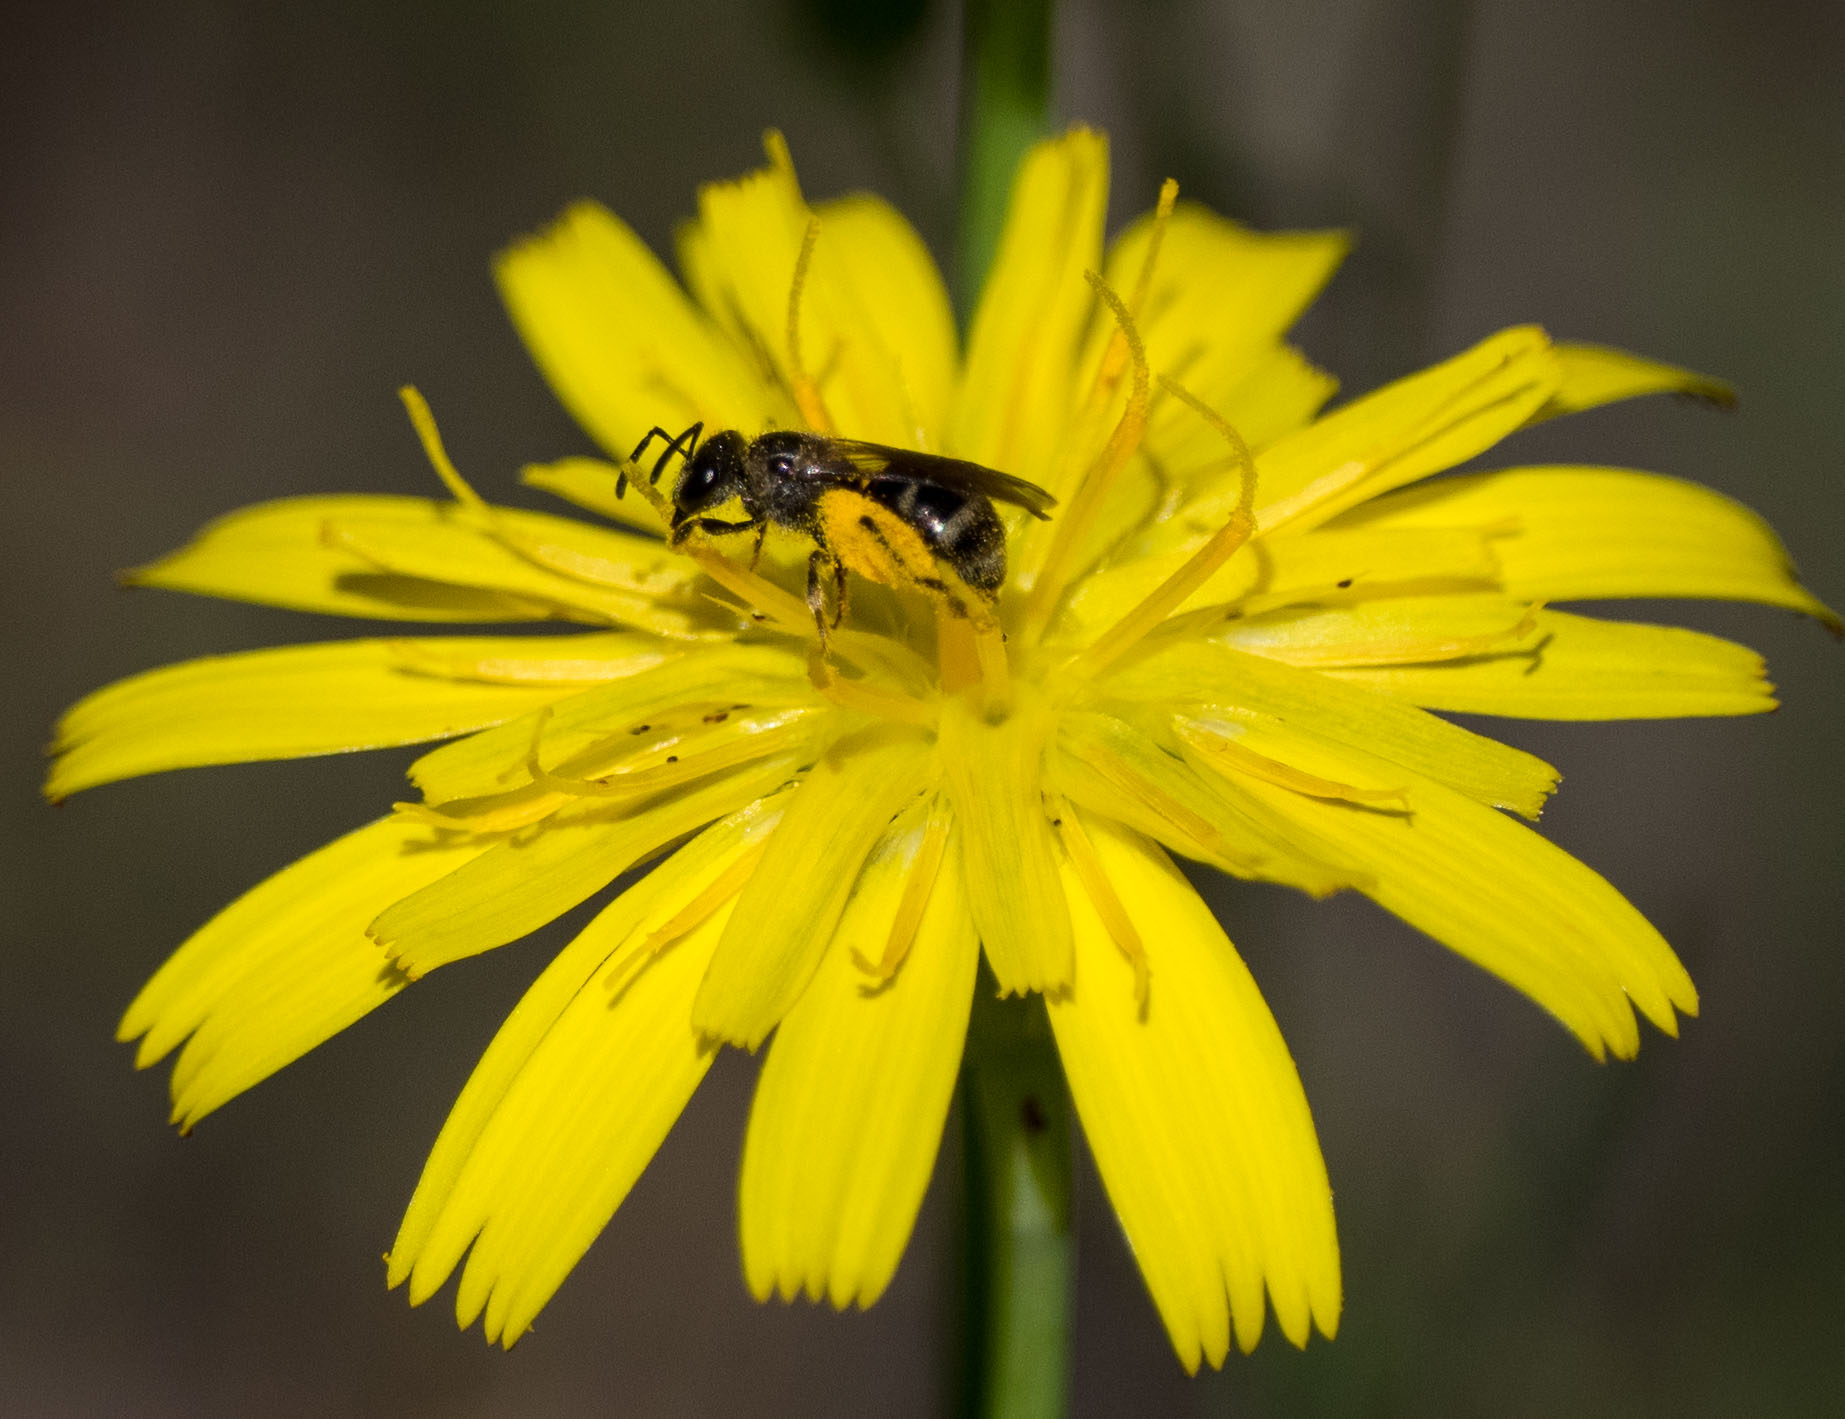 Bee 2 = smaller (possibly  Lassioglossum sp. - Family: Halictidae)